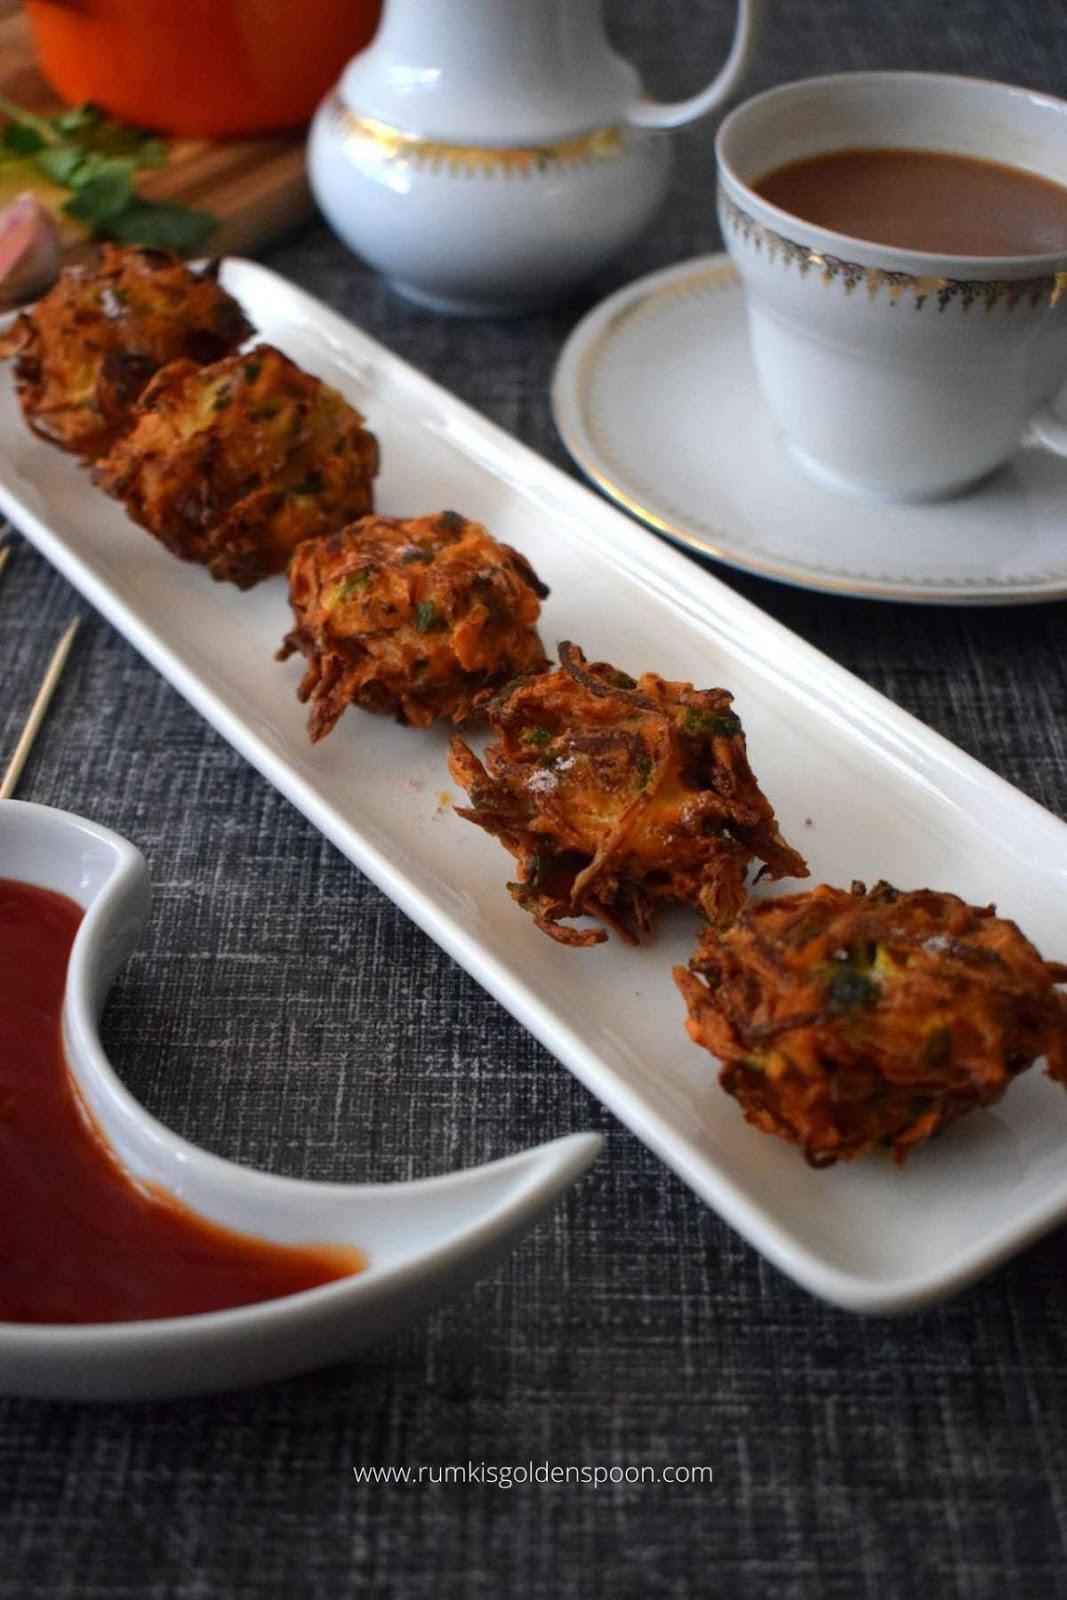 cabbage pakoda recipe, cabbage pakoda, cabbage bajji, how to make cabbage pakoda, recipe for cabbage pakoda, cabbage pakora, cabbage bhajiya, cabbage fritters, snacks recipe, snack recipe, Indian snack recipe, cabbage recipe, cabbage recipes, cabbage recipes Indian, recipe of cabbage, recipe for cabbage, recipe with cabbage, recipe for vegan snacks, recipe for pakoda, vegan snacks recipe, indian recipe for snacks, Indian snacks recipe, Rumki's Golden Spoon